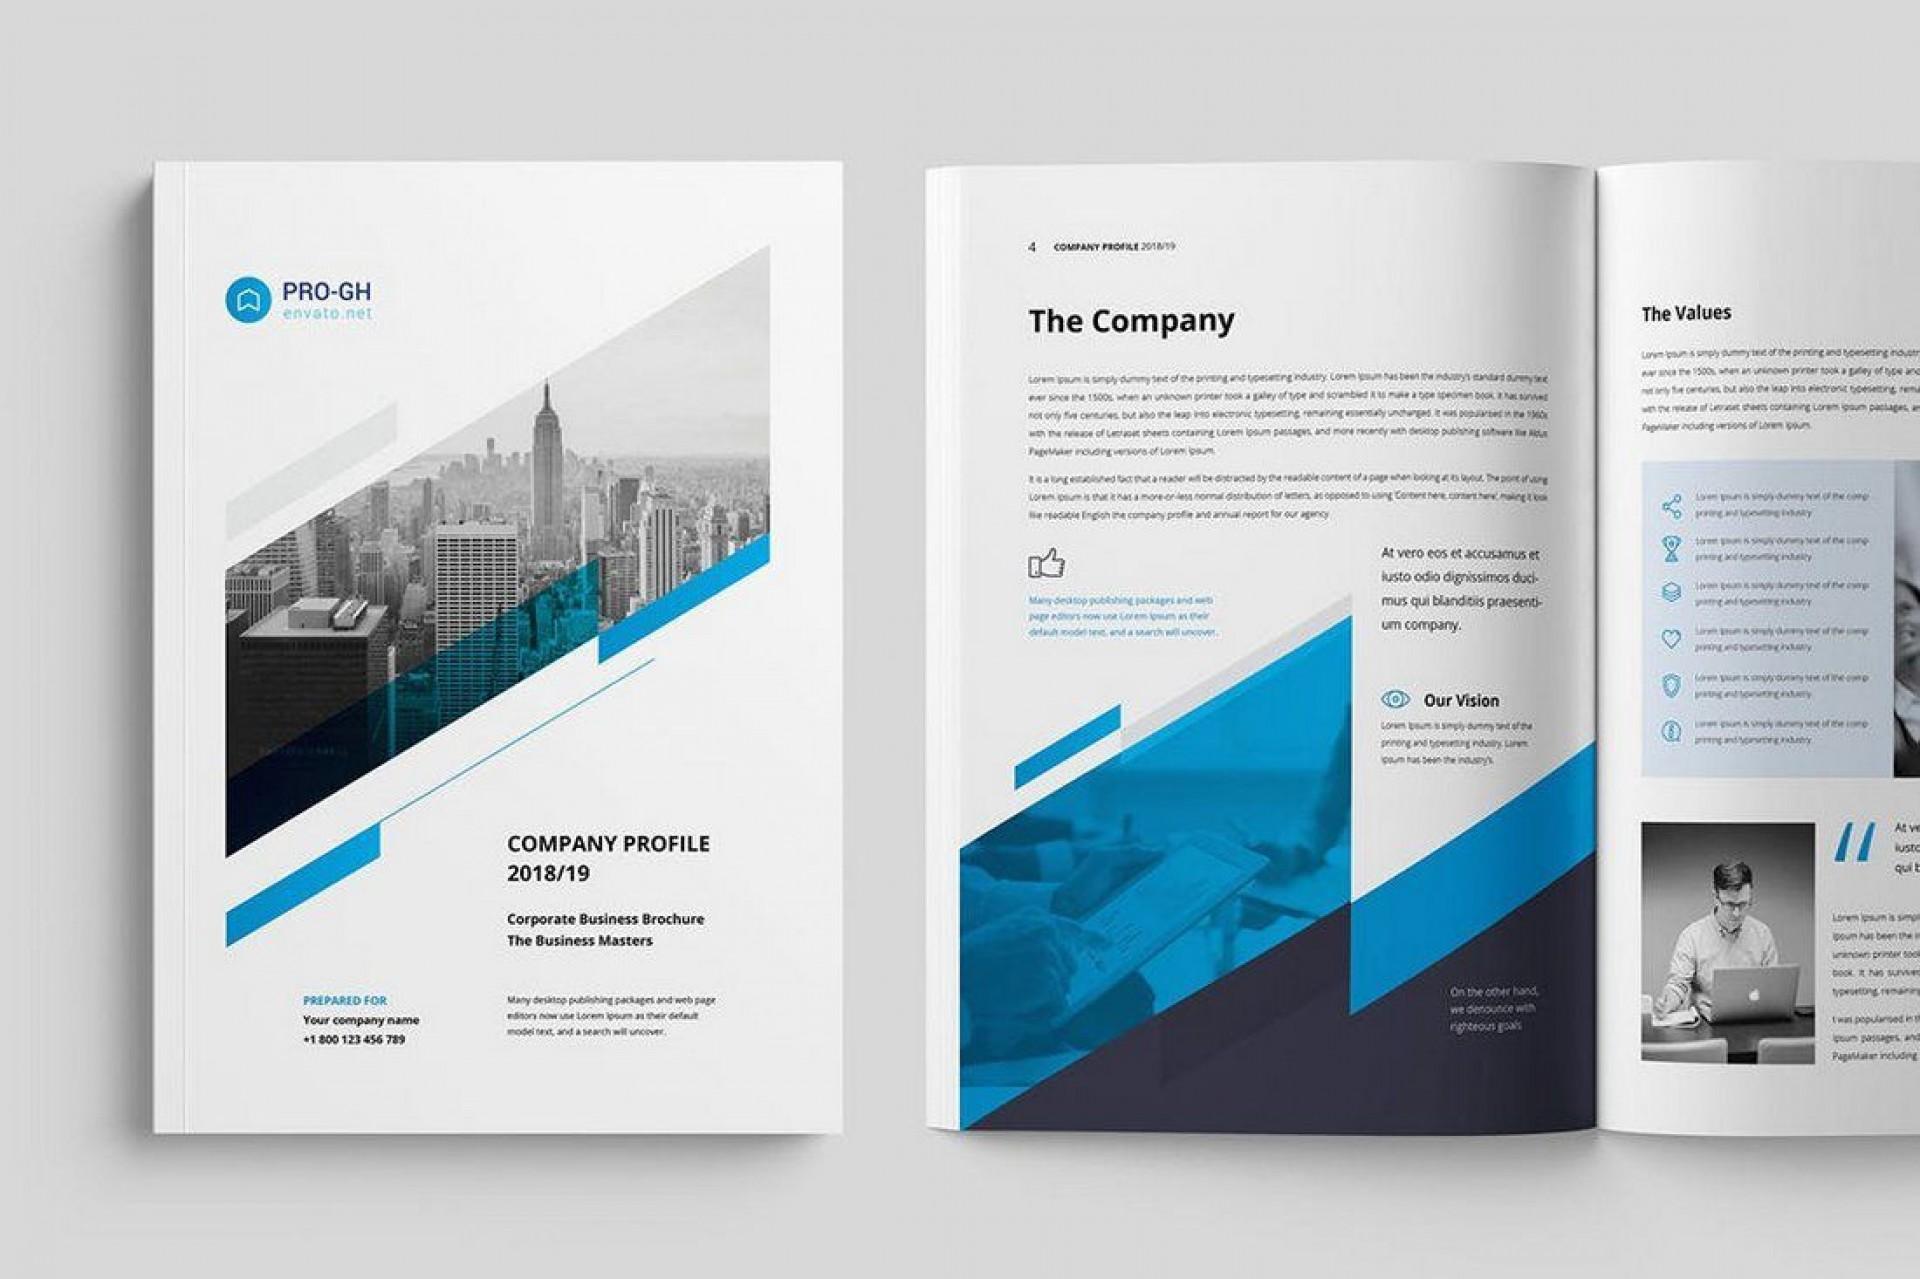 008 Rare Free Psd Busines Brochure Template High Def  Templates Flyer 2018 Corporate1920